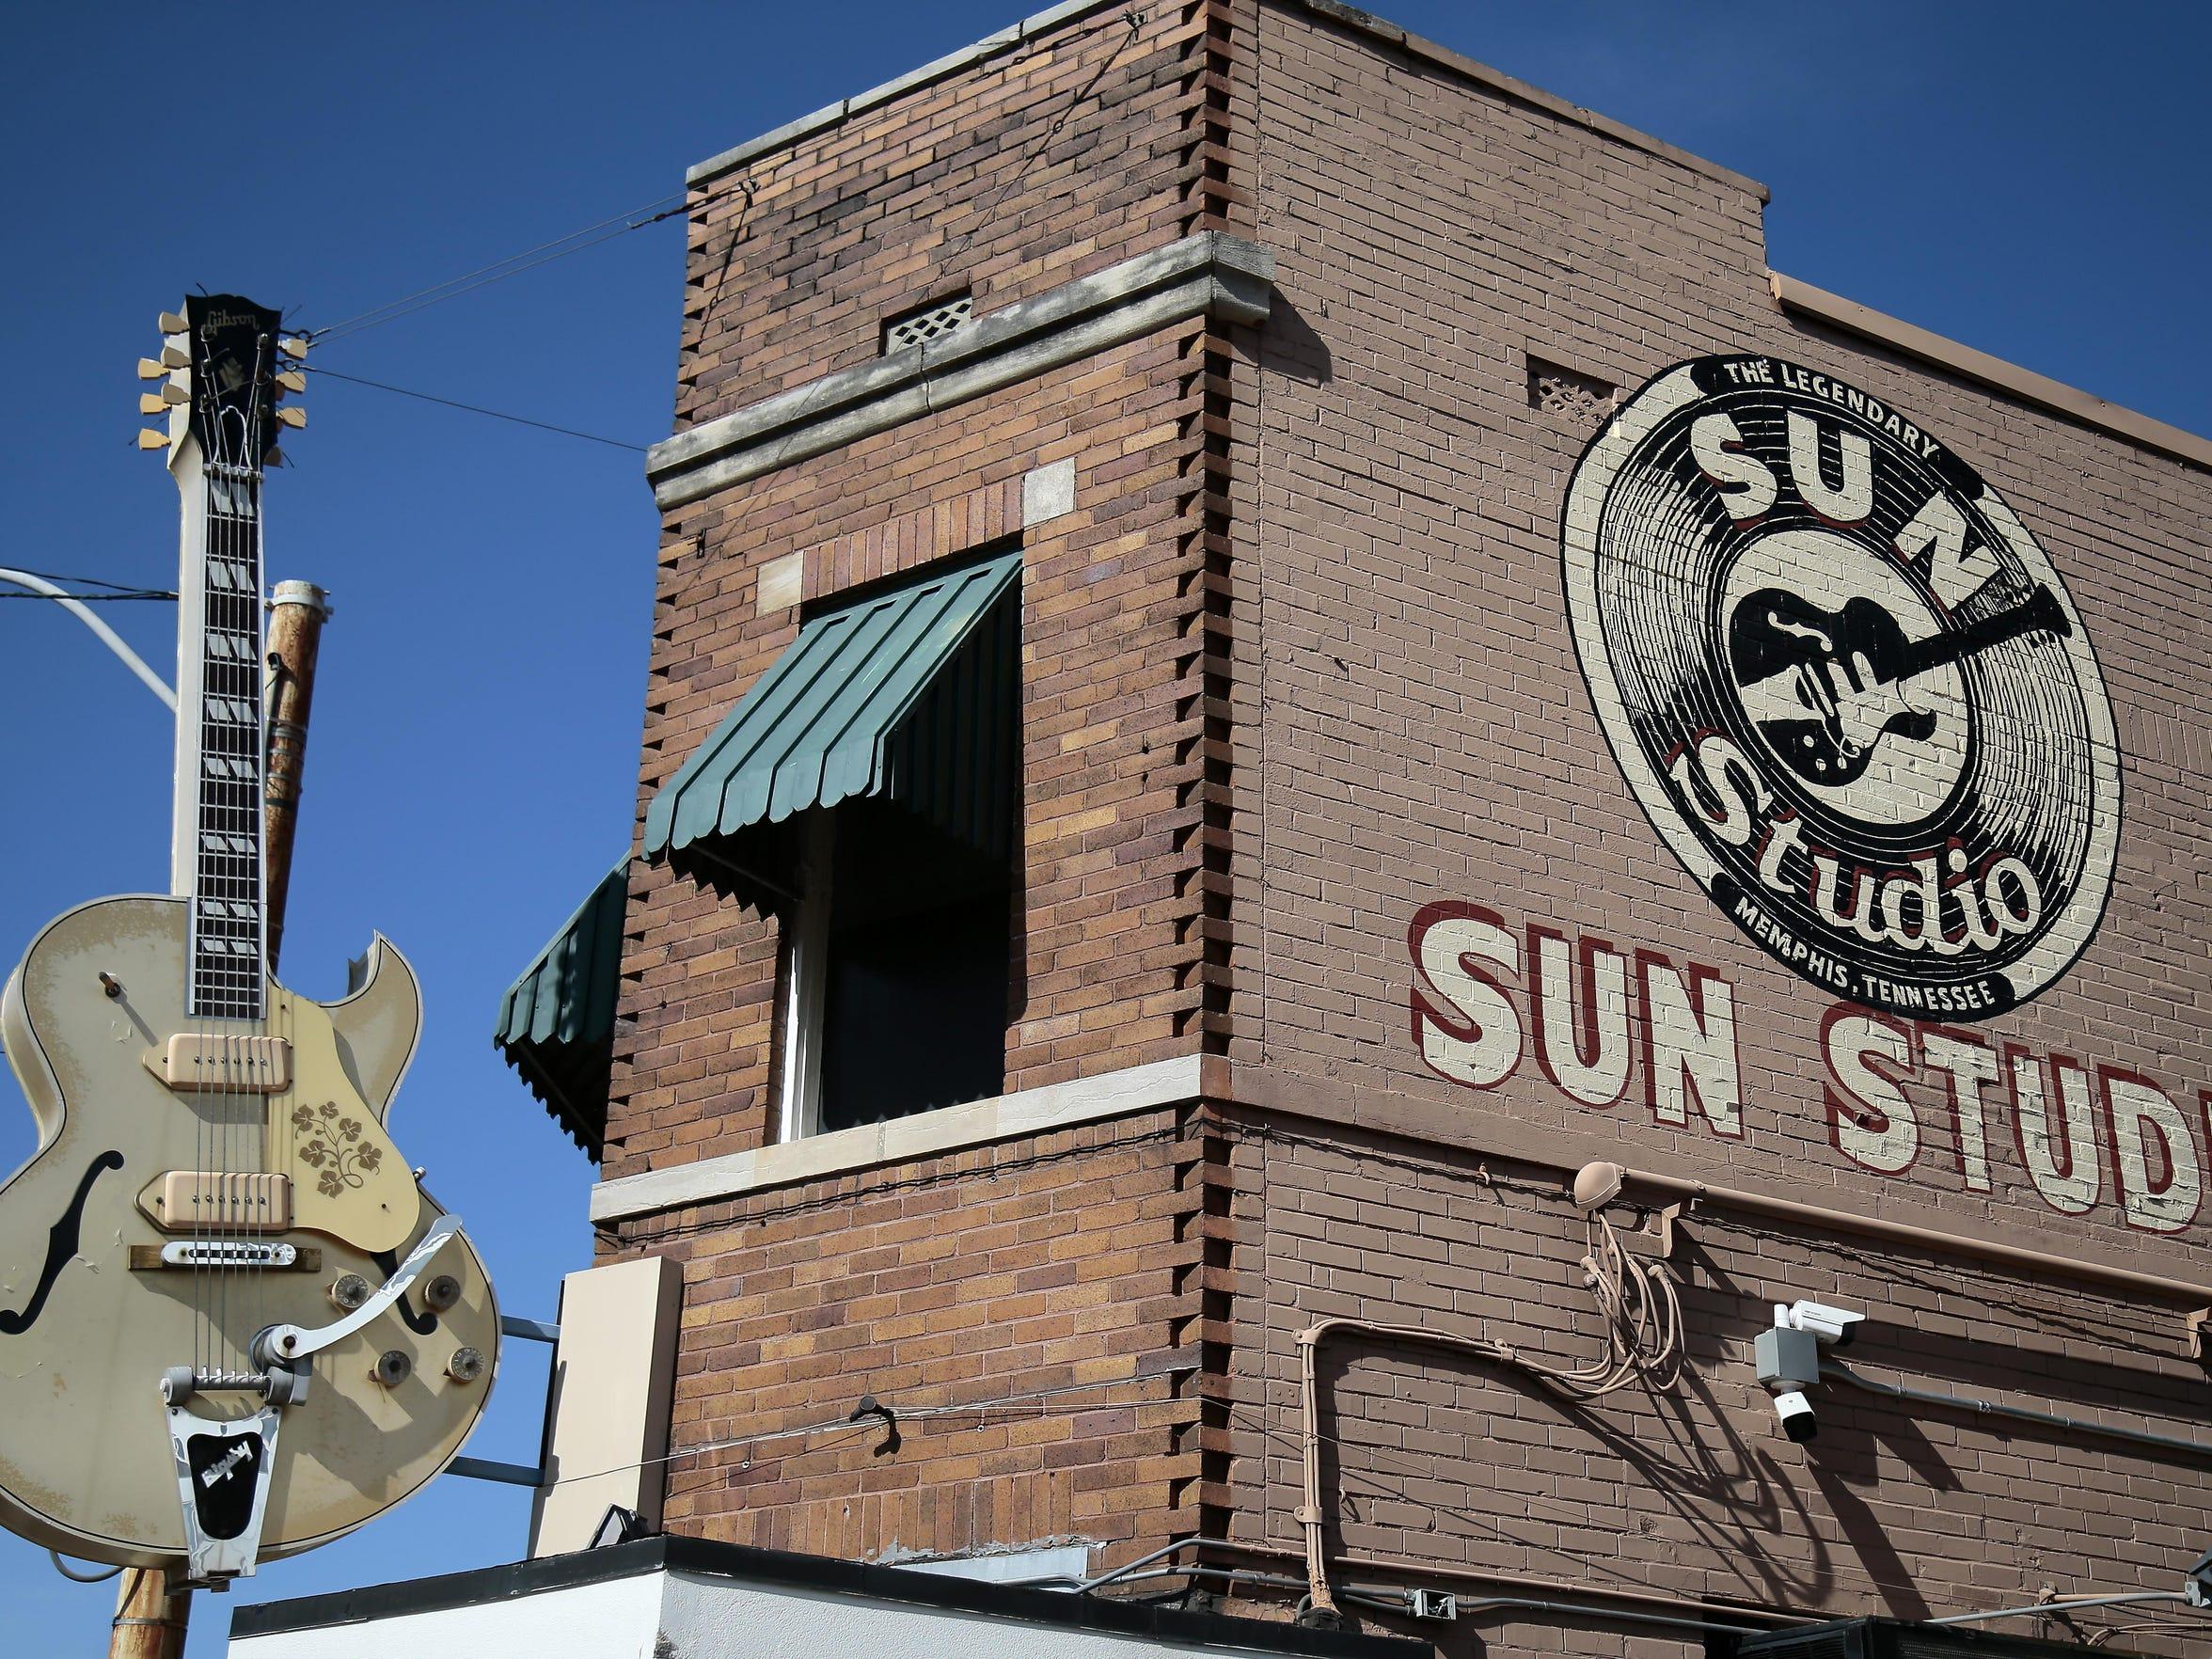 The Sun Studio building in Memphis, Tenn., today.